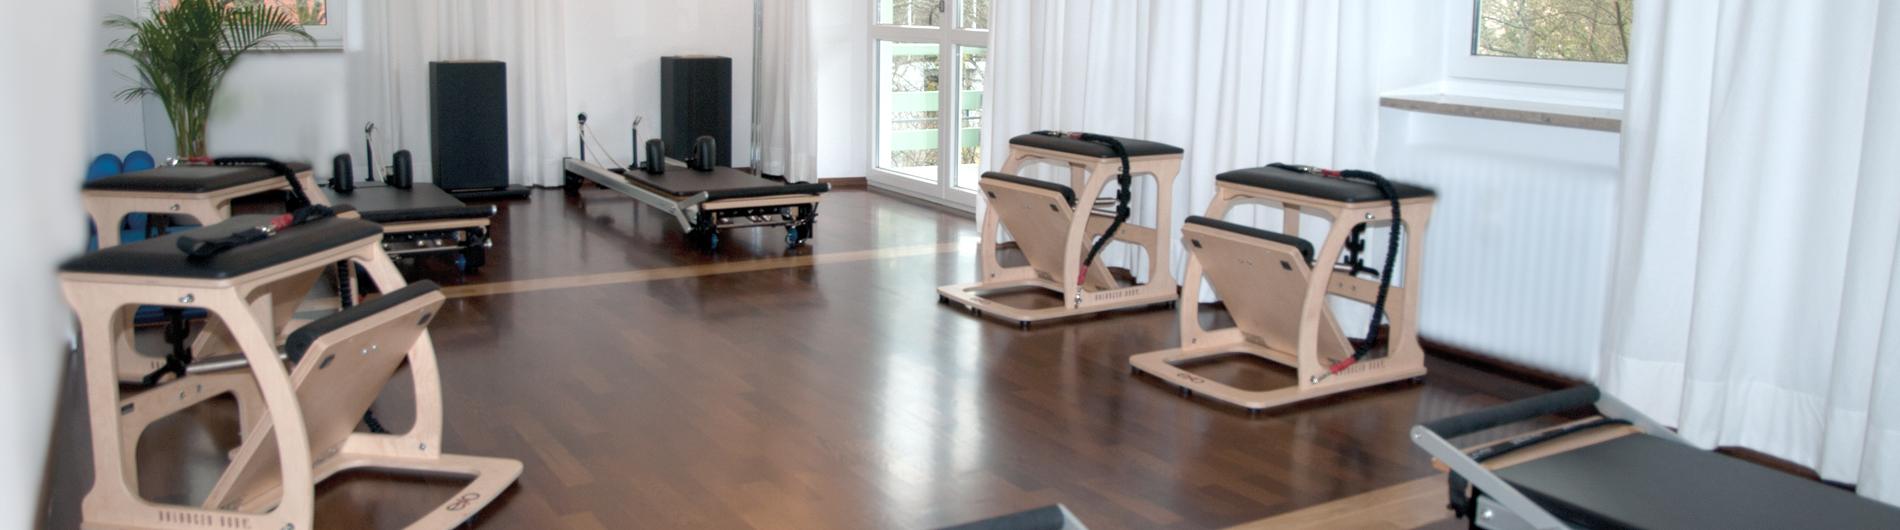 Pilates-studio-p